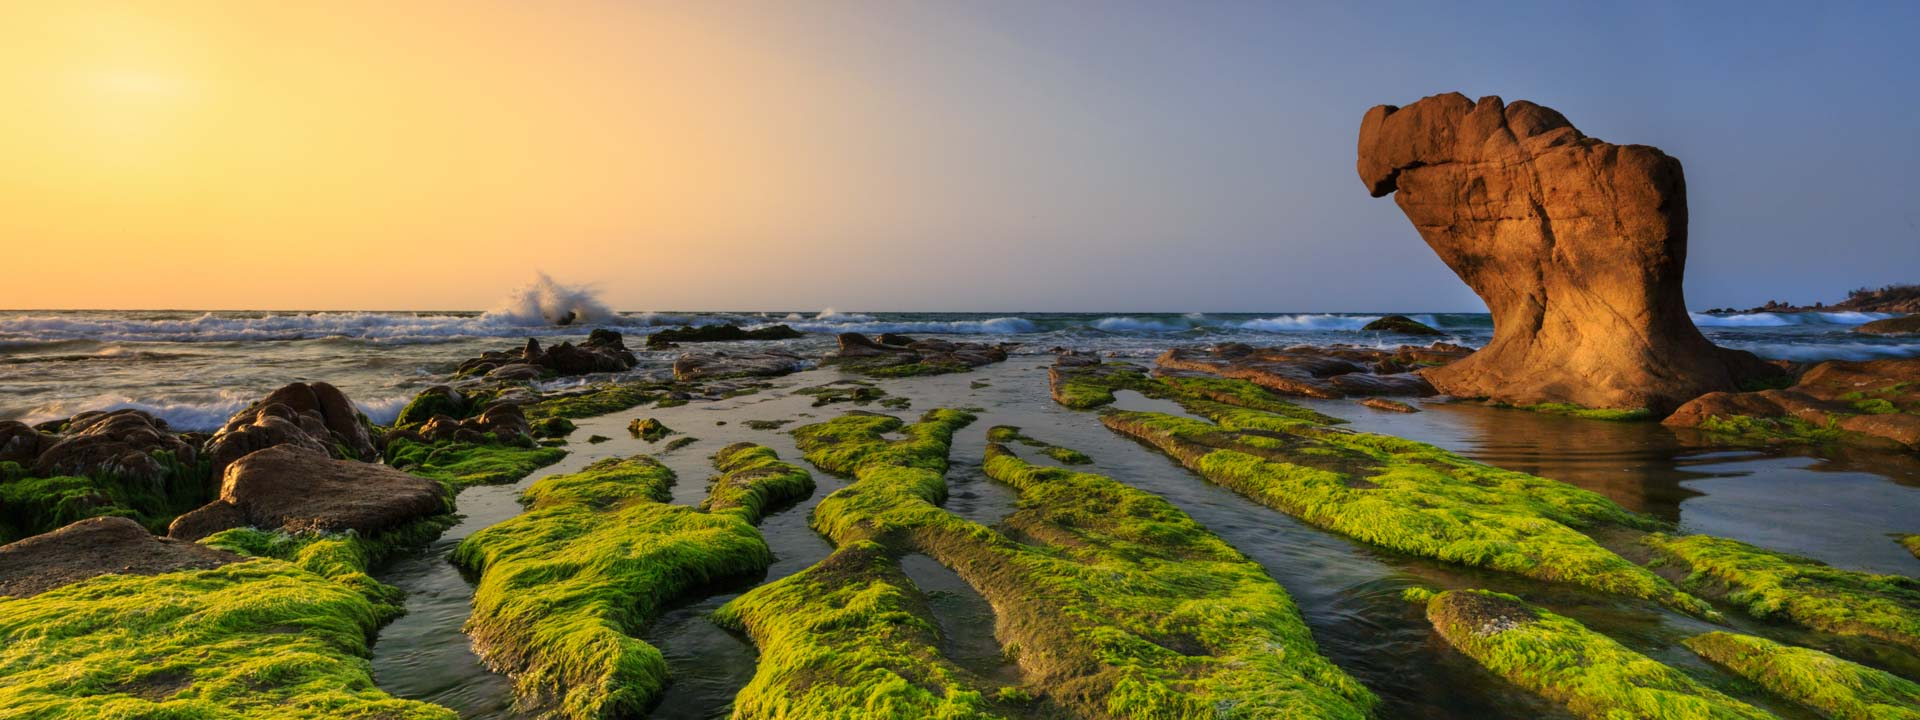 Phan Thiet Beach Getaway 4 days